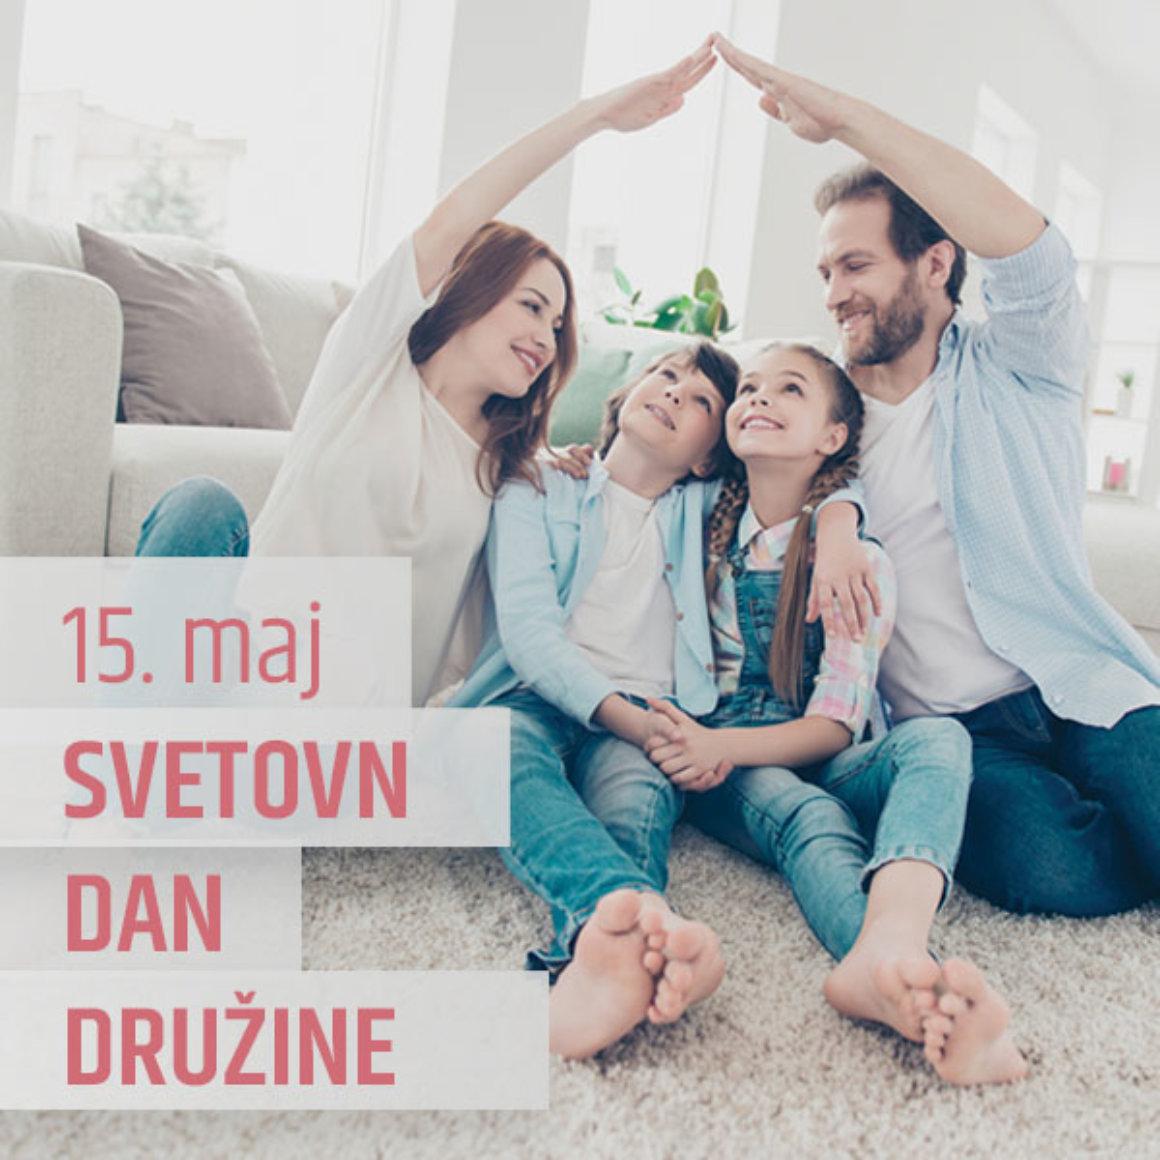 Uprastan-svetovni-dan-druzine-web-02